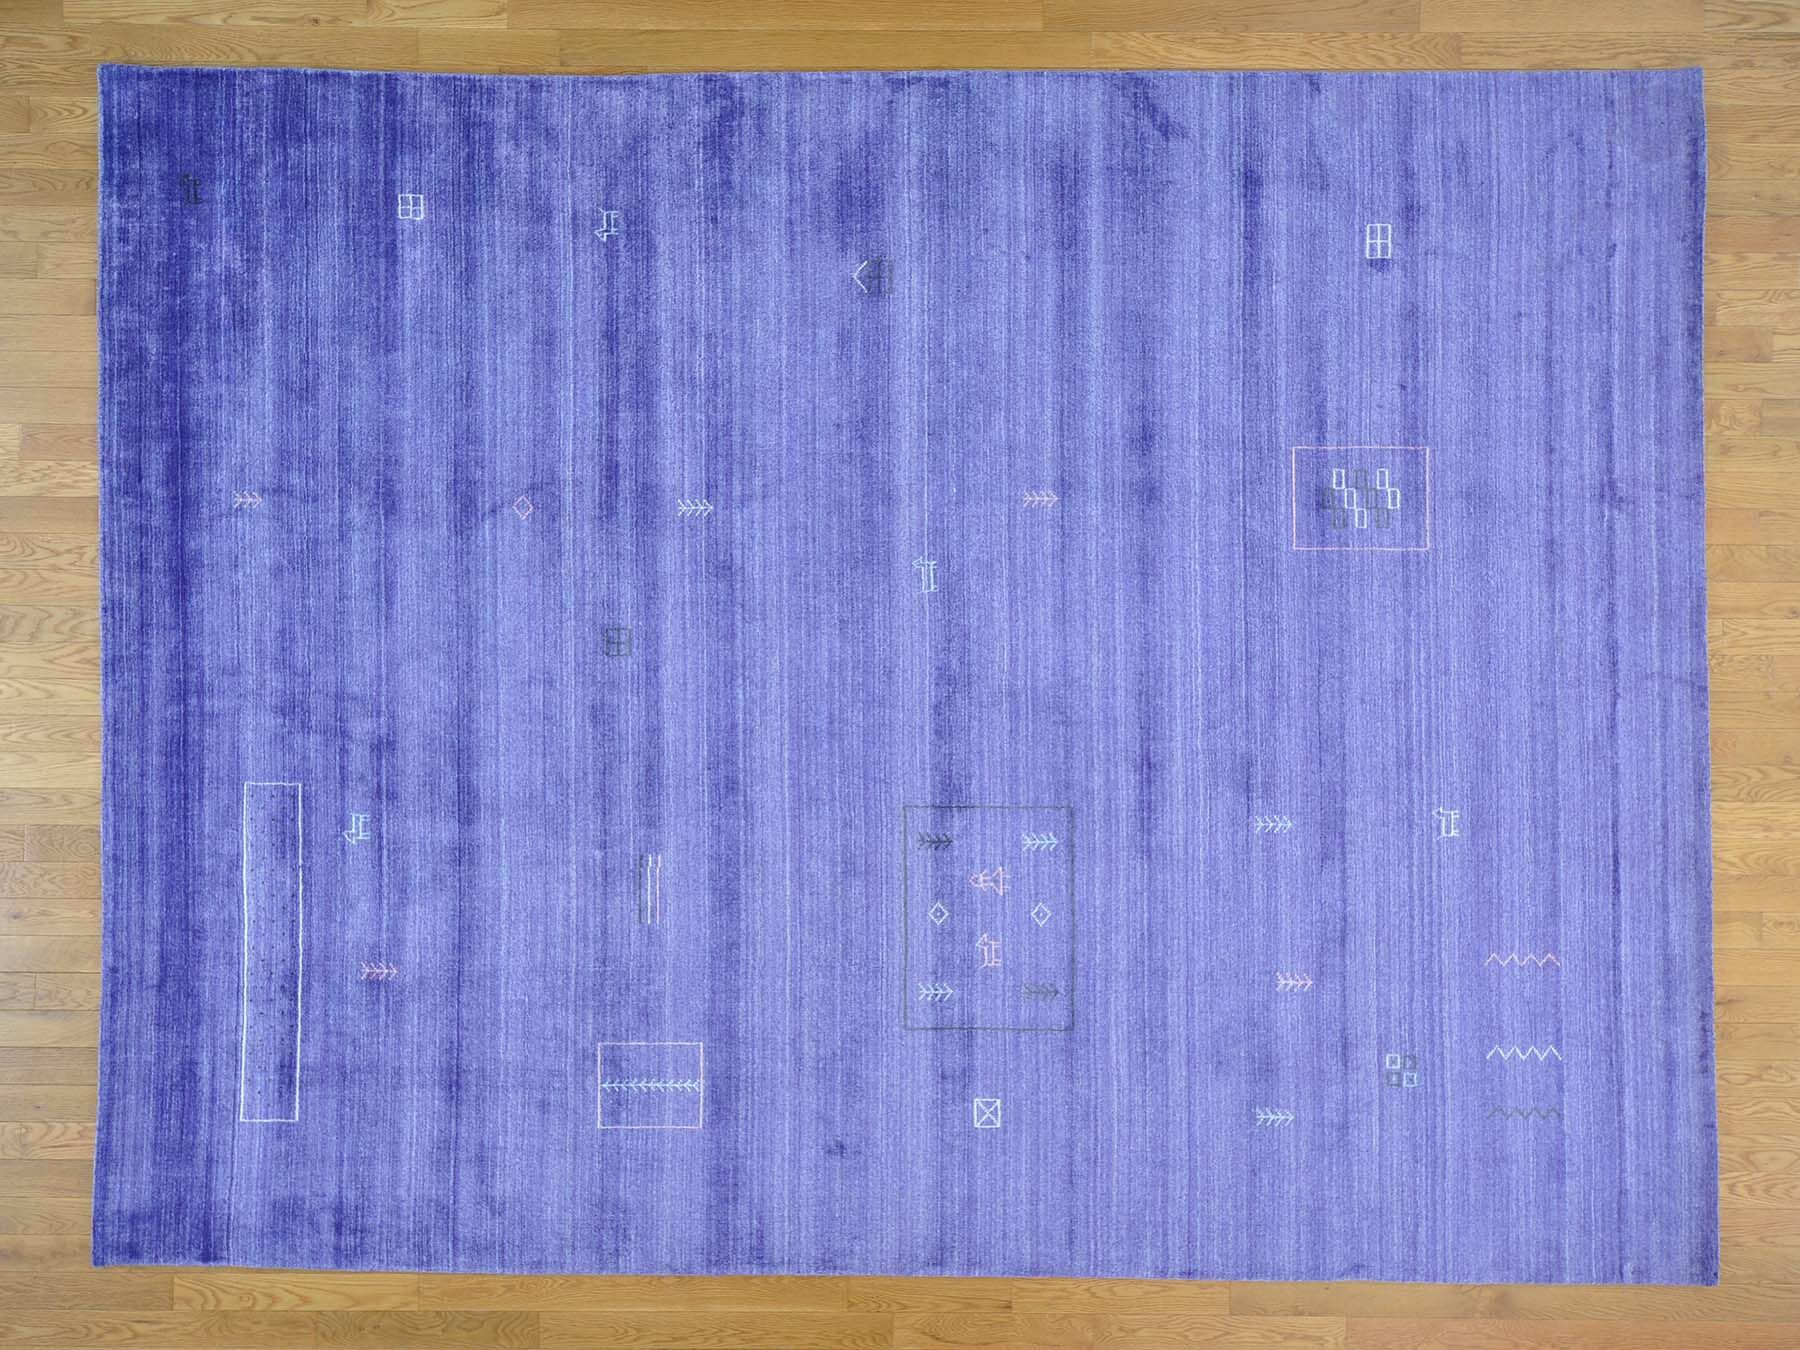 One-of-a-Kind Becker Art Handwoven Purple Silk Area Rug